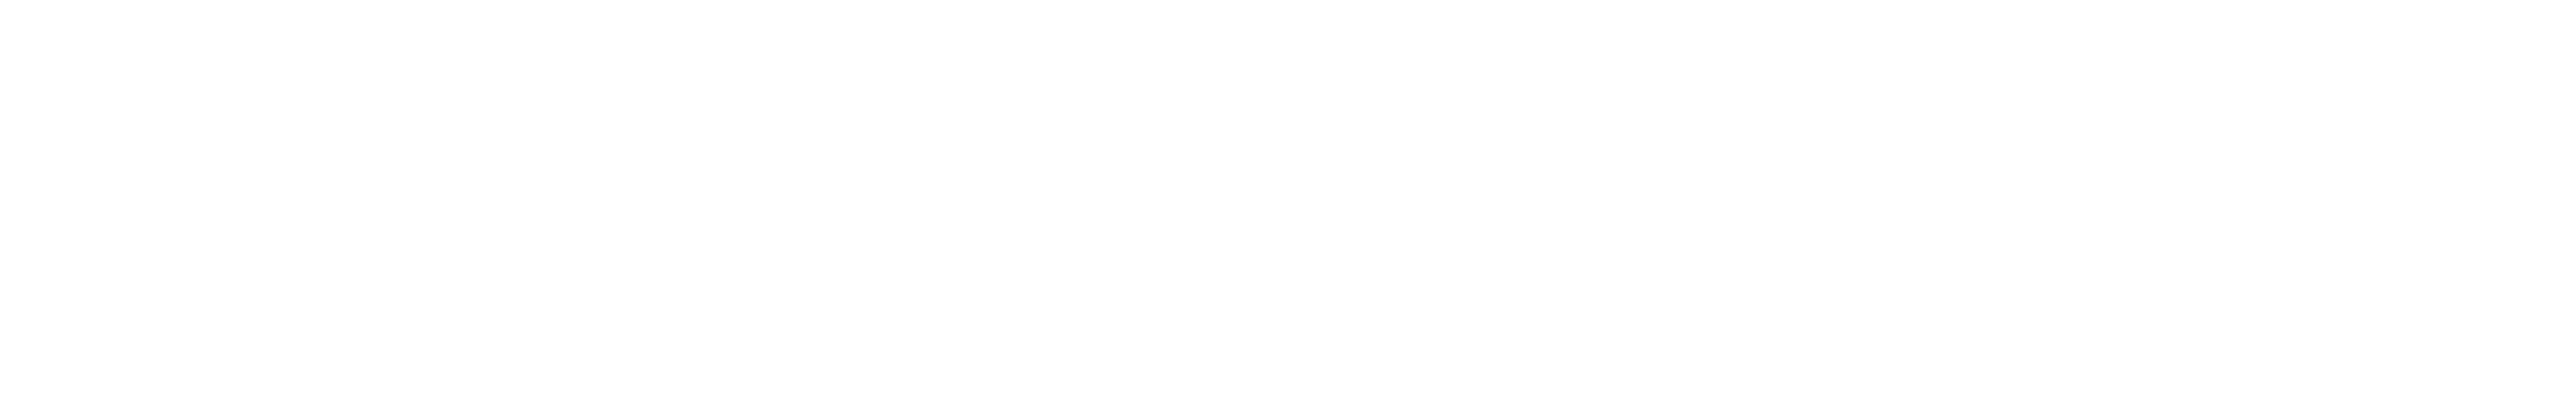 Rumbleon logo white